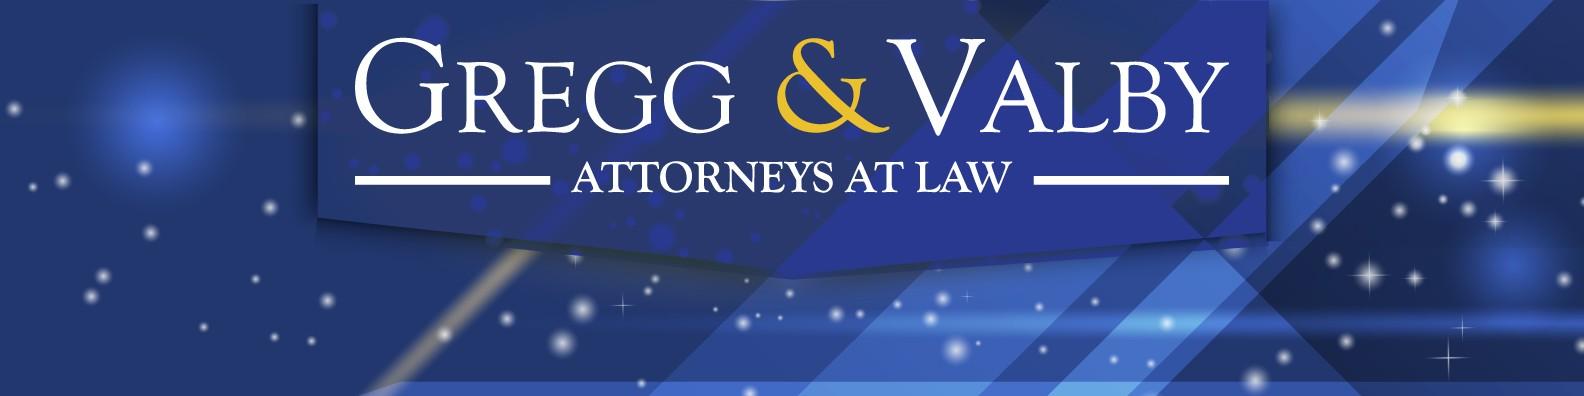 Gregg & Valby, LLP | LinkedIn